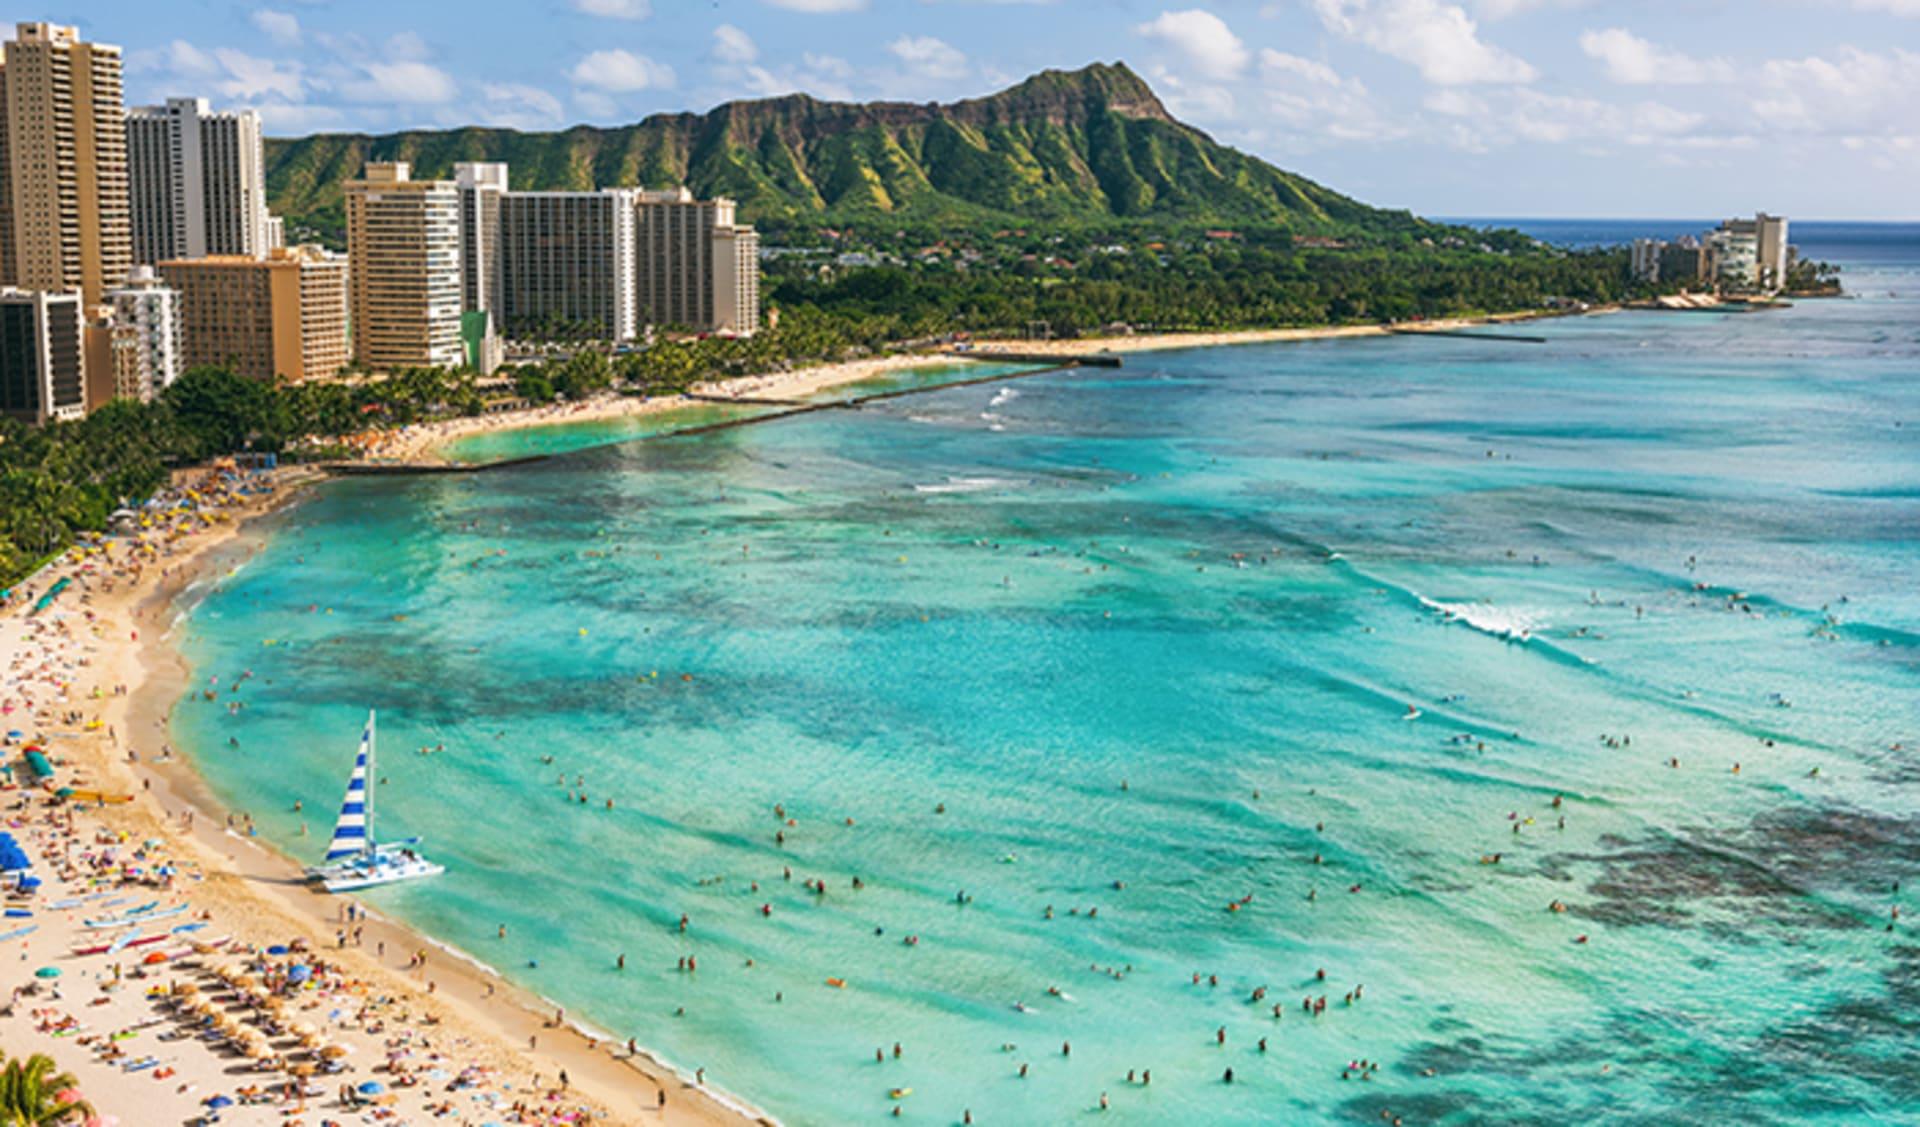 Hawaii Oahu Reisen, USA